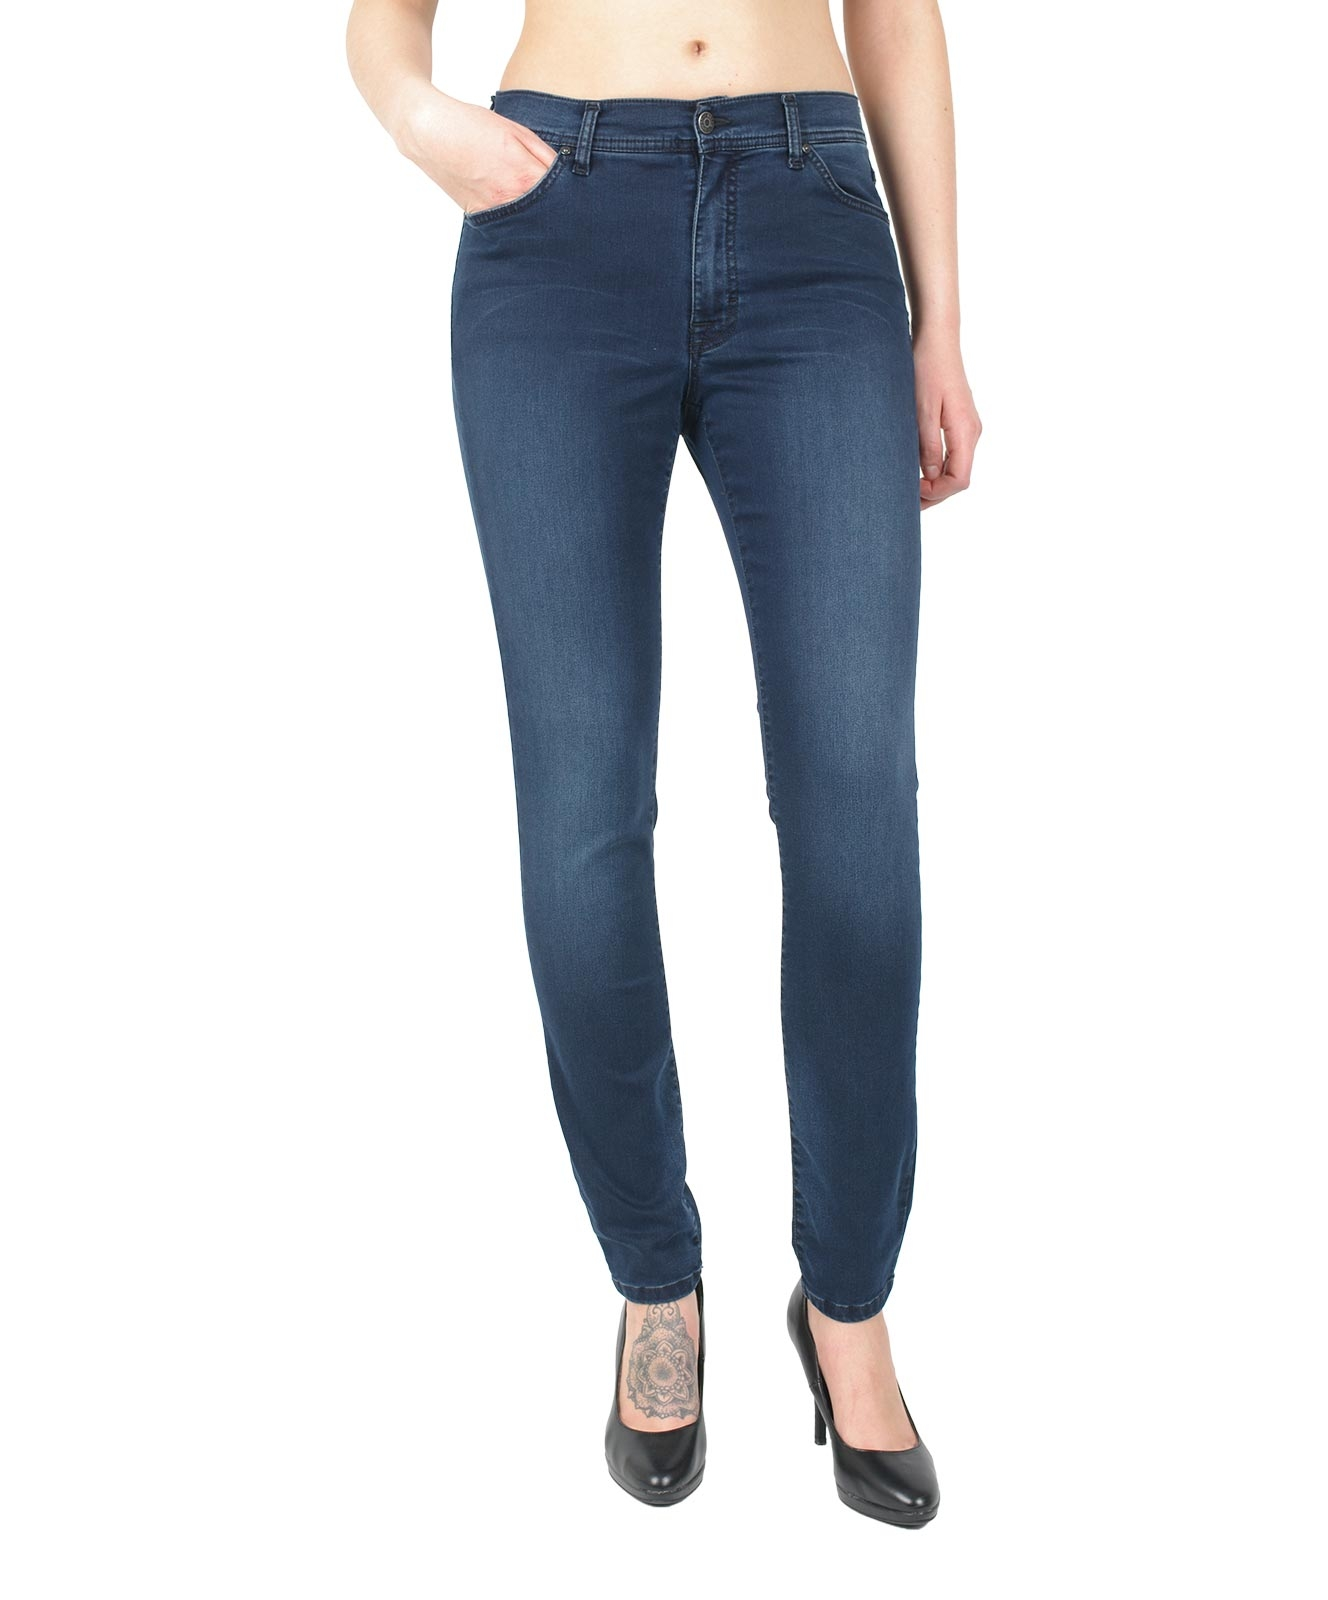 Hosen - Angels Jeans Röhre Skinny in Blue Blue Used  - Onlineshop Jeans Meile